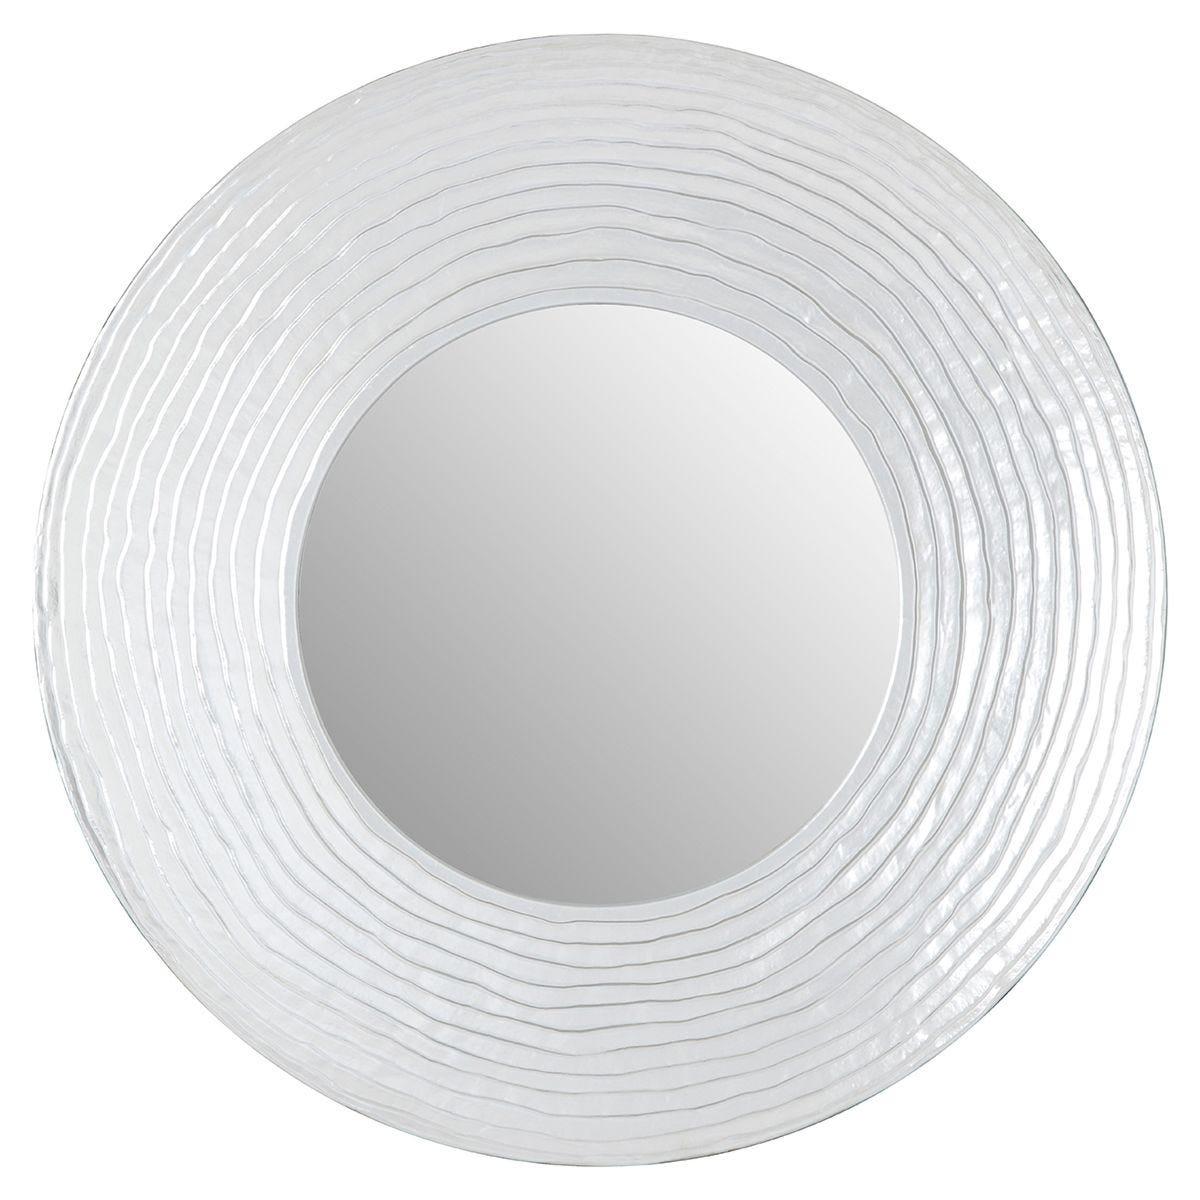 Premier Housewares Round Wall Mirror - Silver Finish